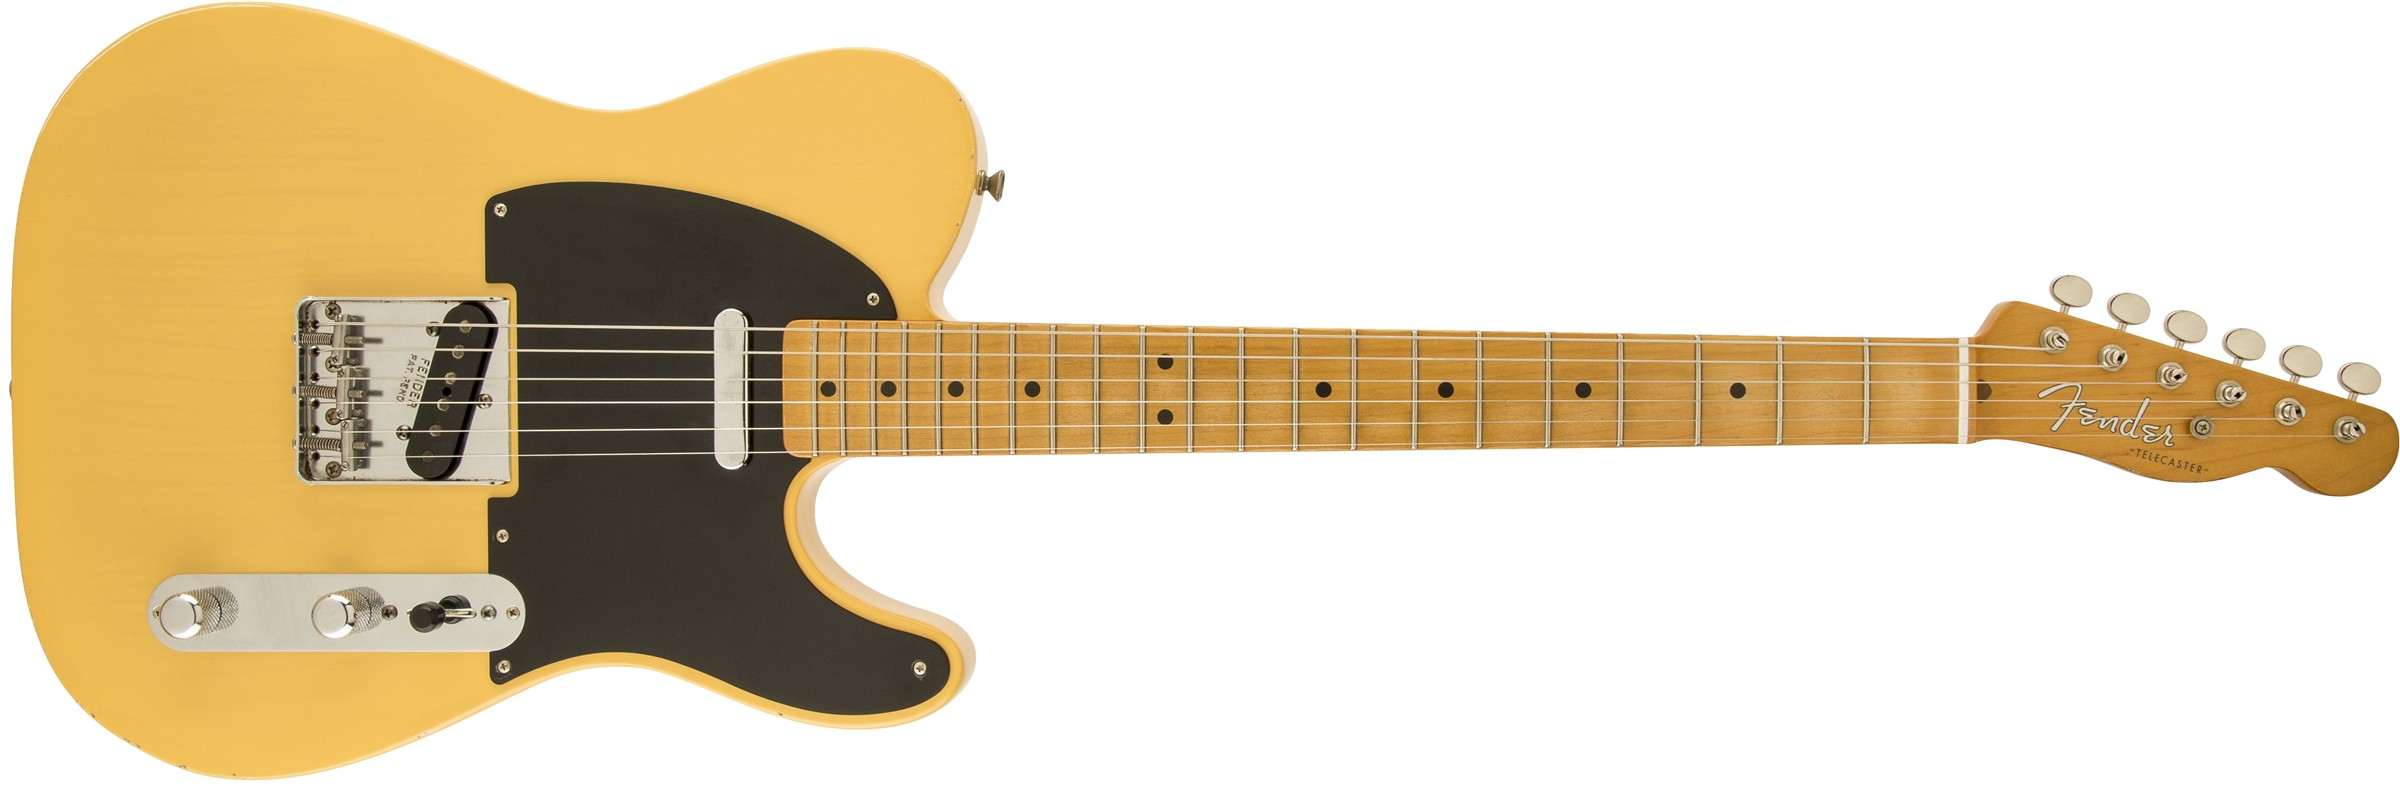 Fender Road Worn 50s Telecaster Blonde MN